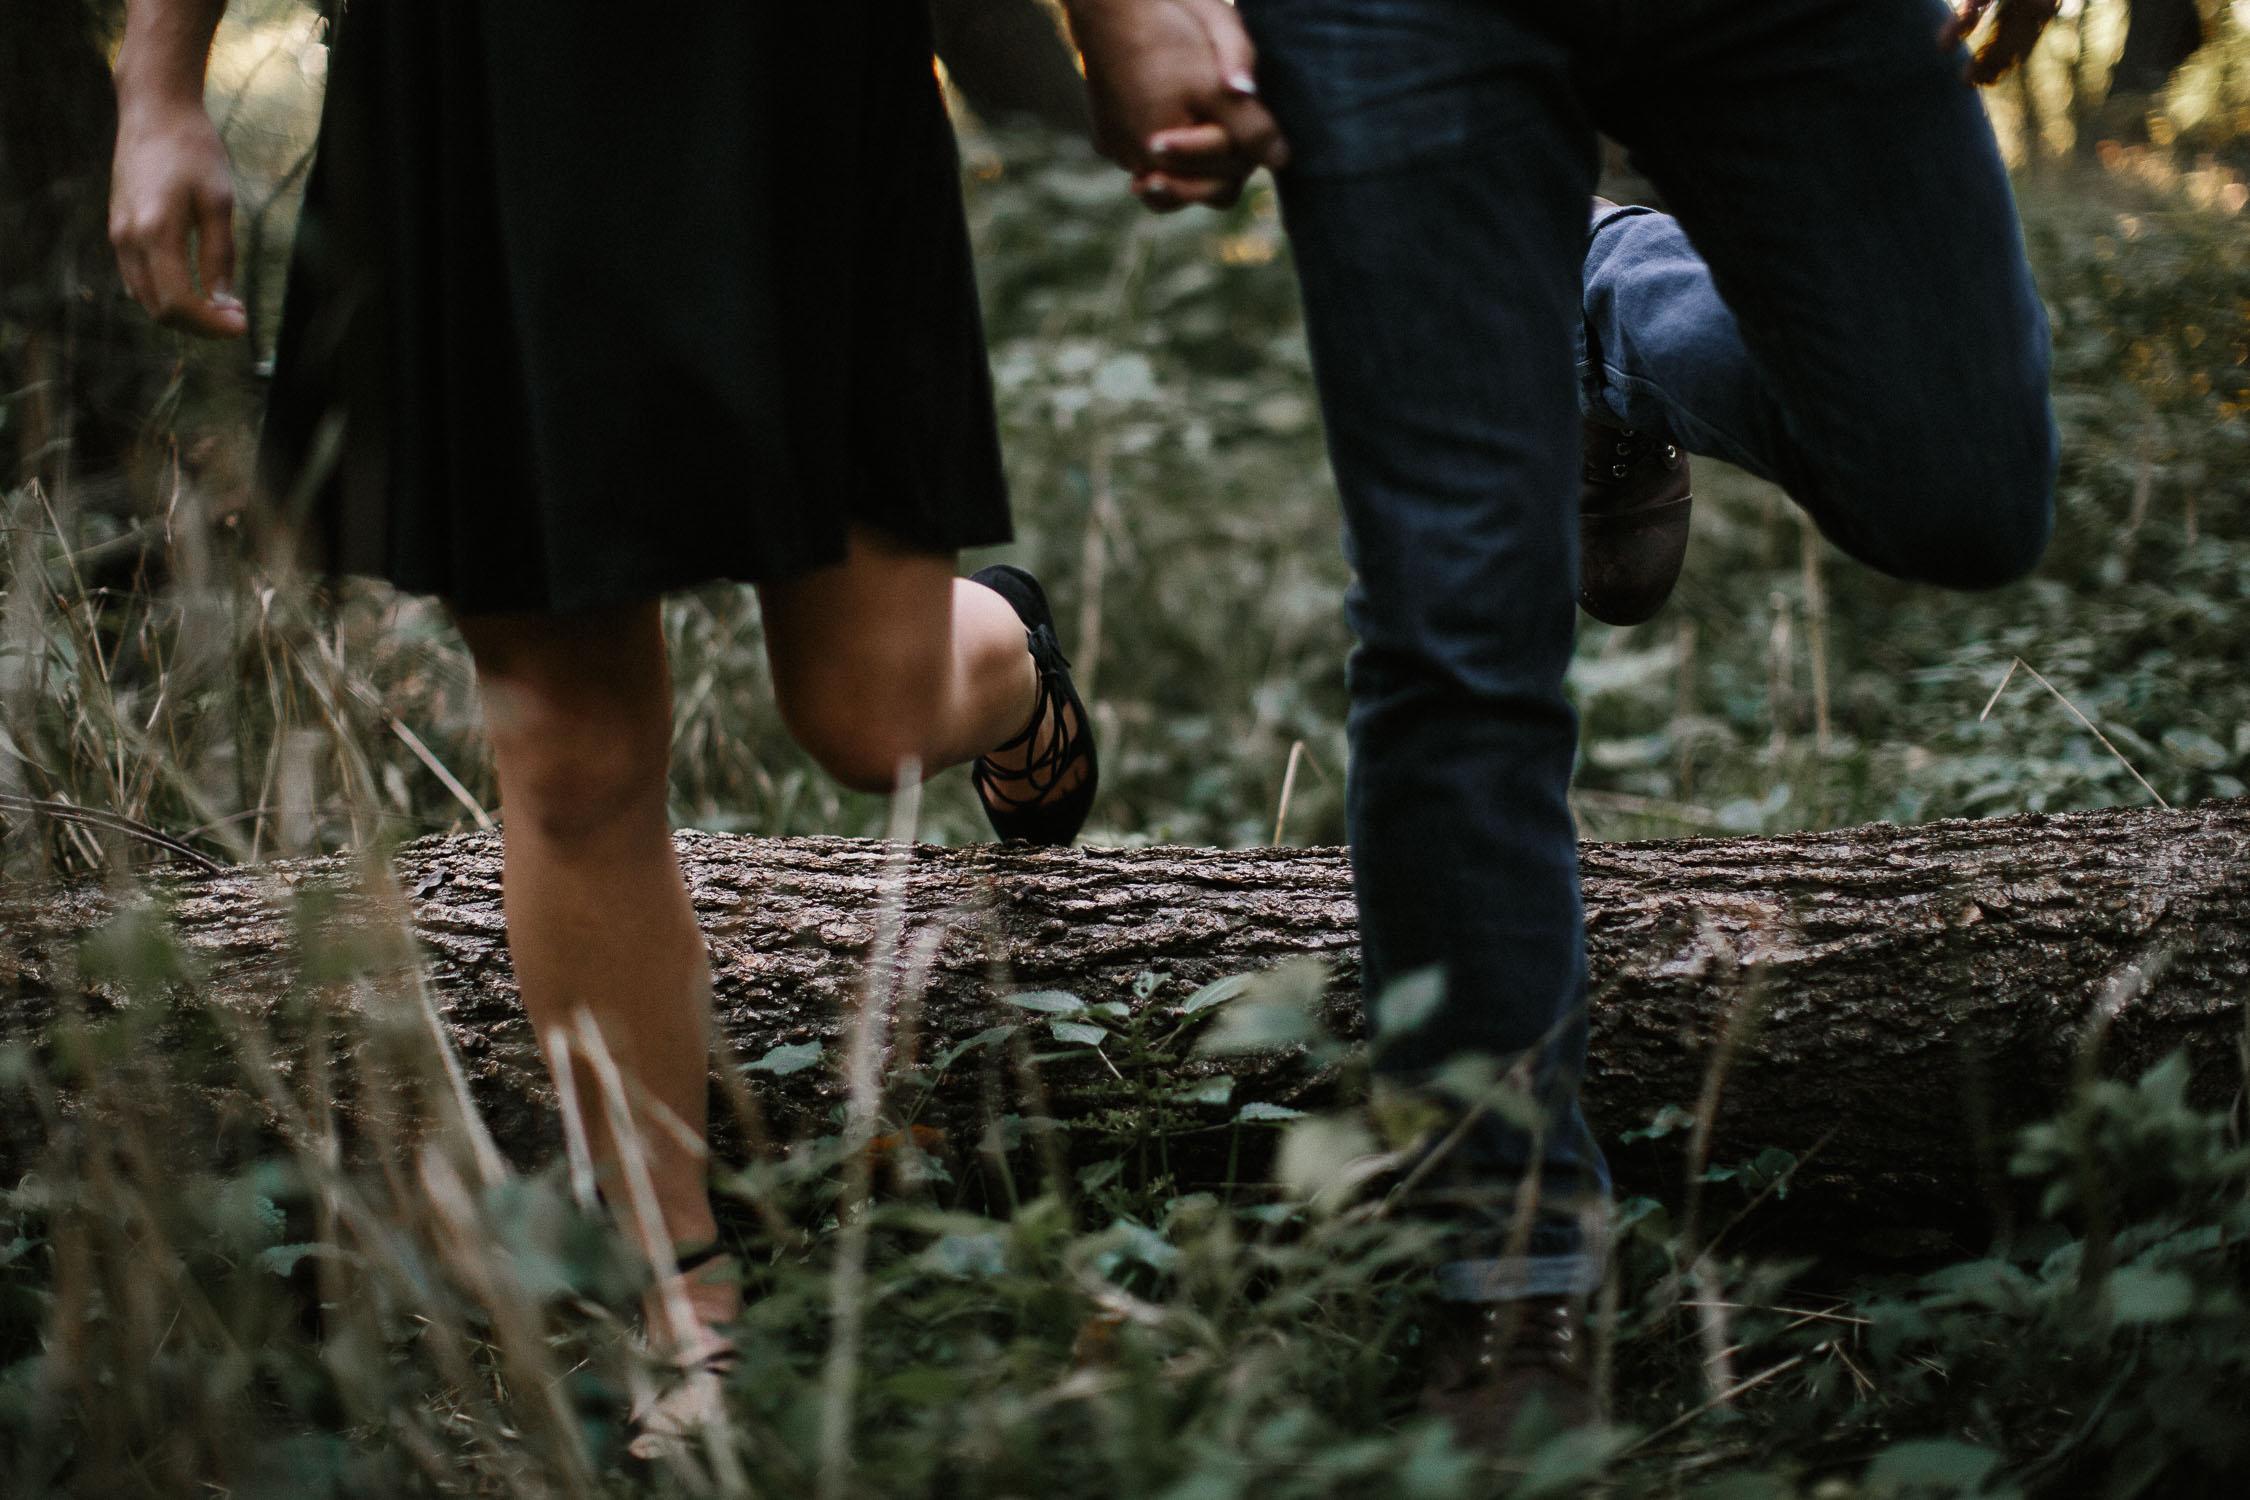 Romantic_Timeless_Downtown_SiouxFalls_Engagement_Wedding_Photographer_35.jpg